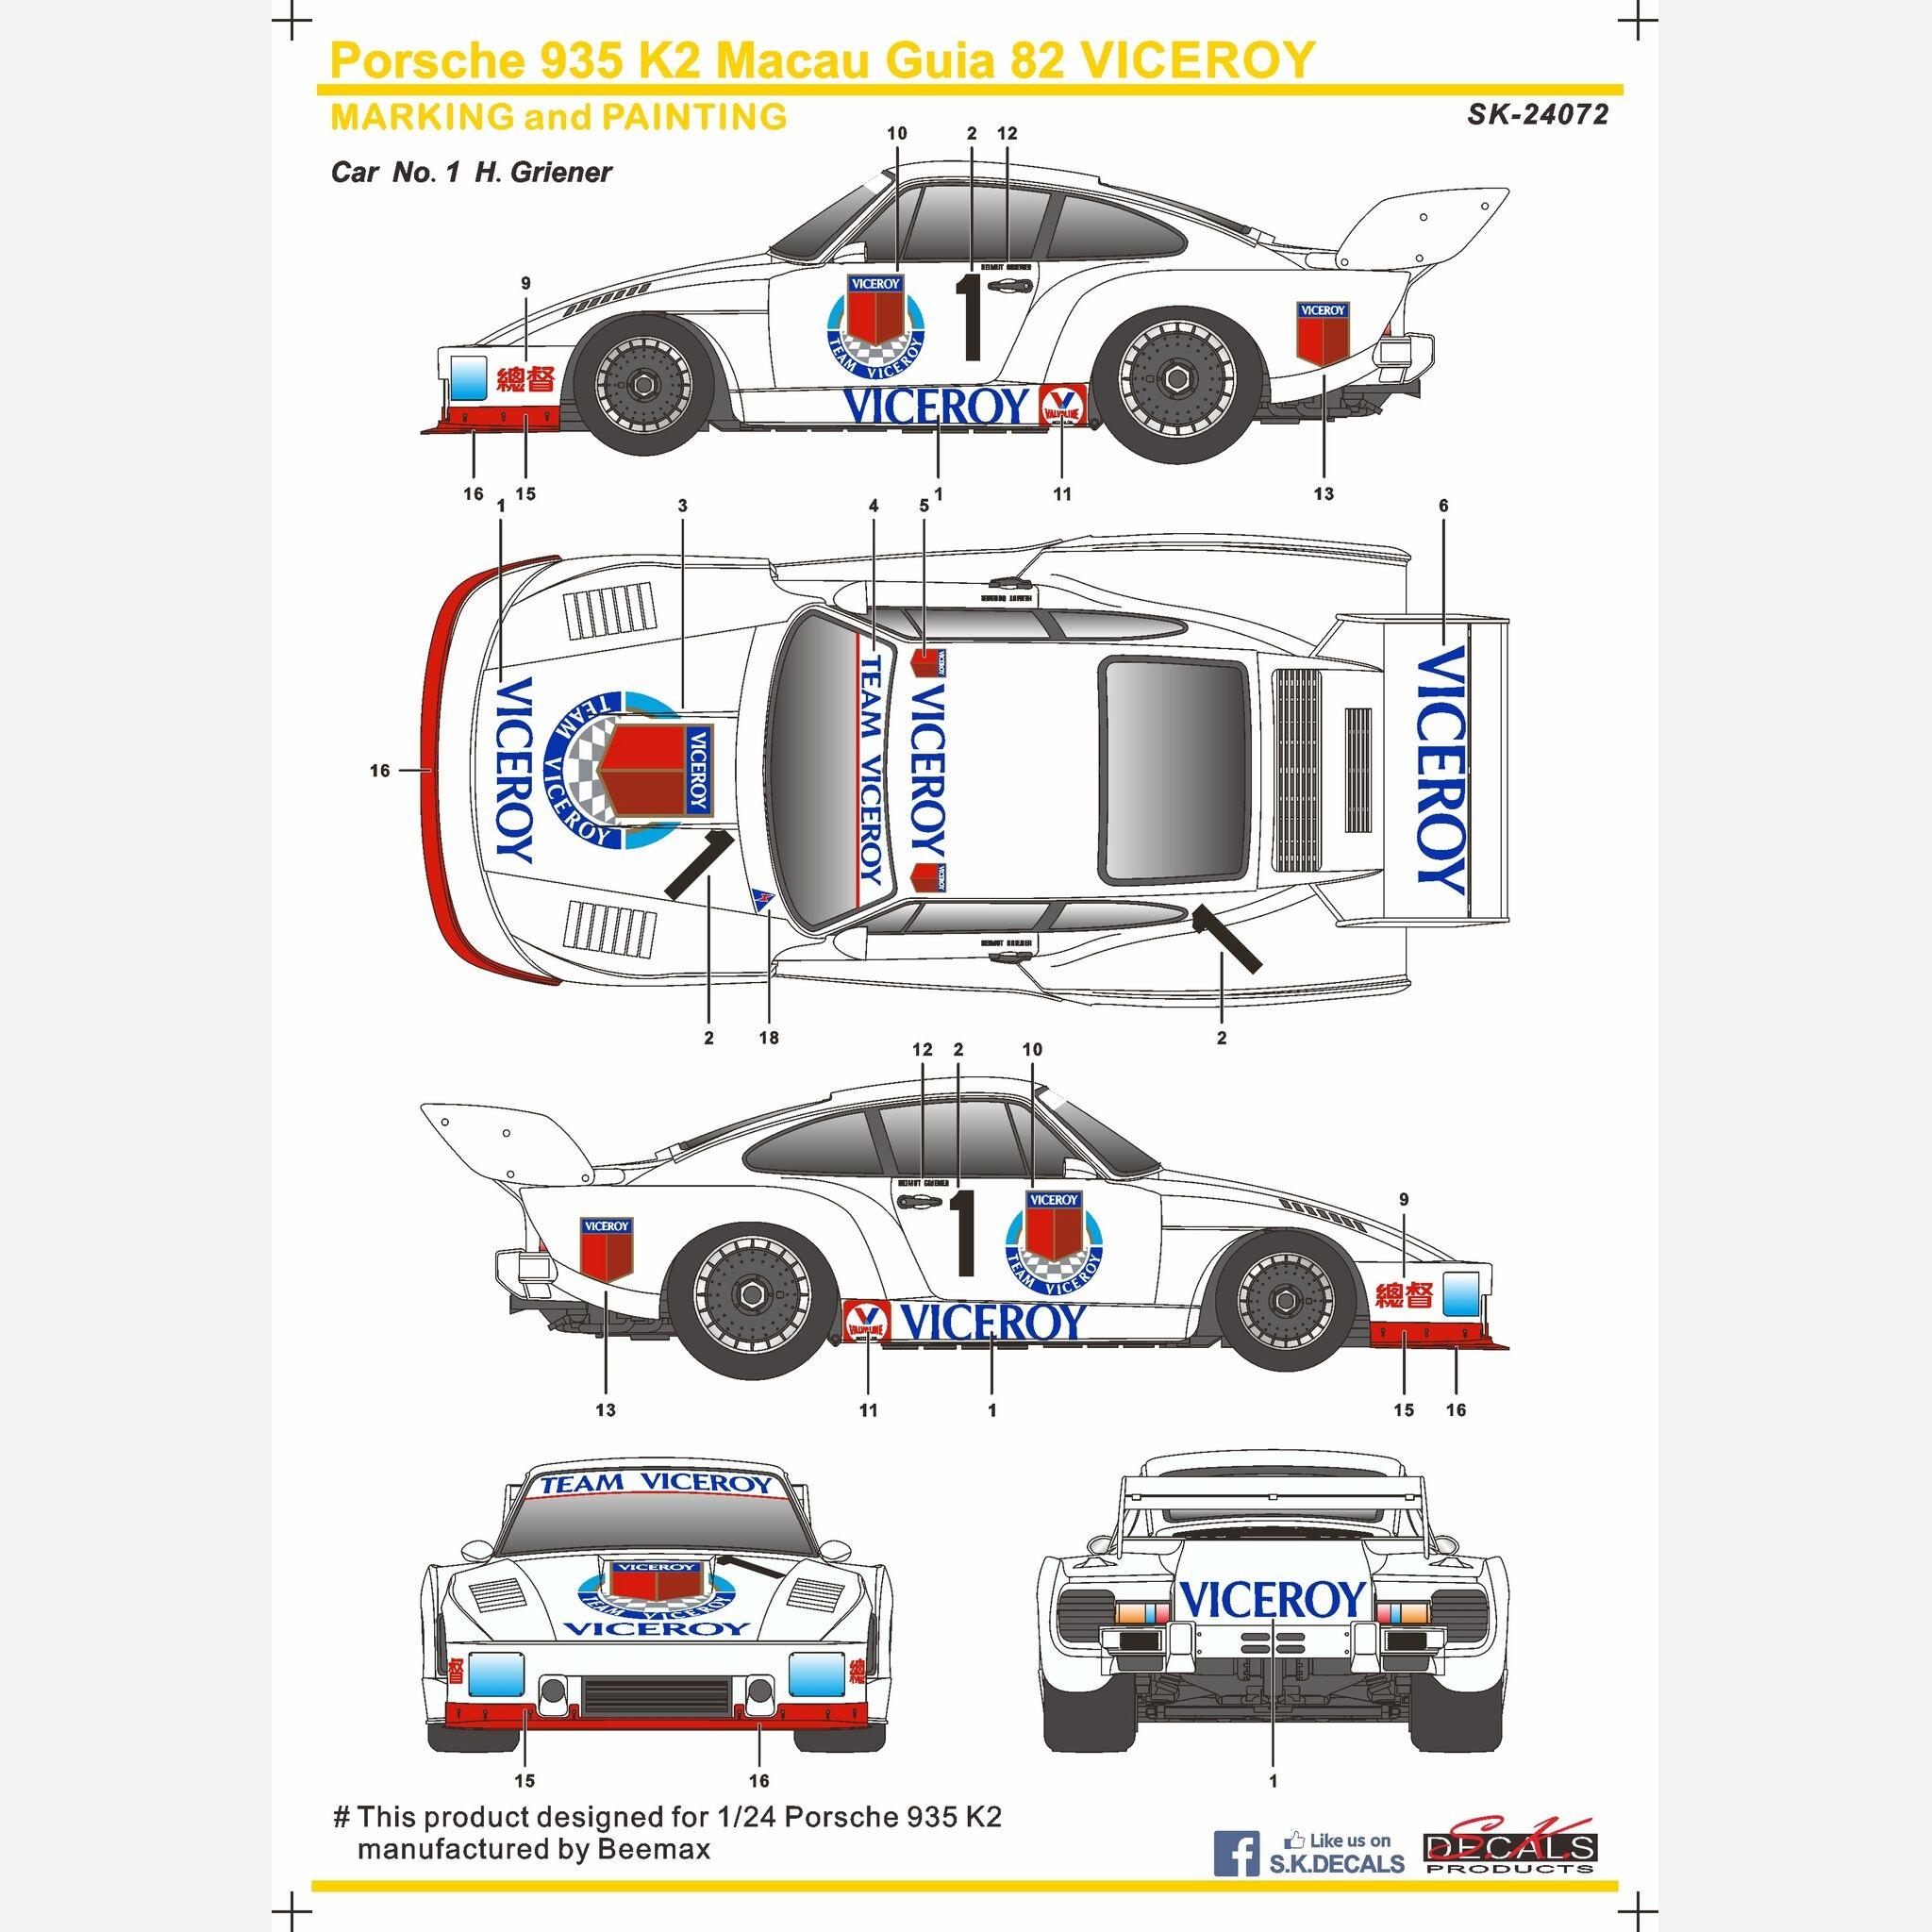 S K  Decals, Porsche 935 K2 Macau Guia 82 VICEROY - SK24071 — Premium  Hobbies: U K  Stockist of Splash Paints, MRP Mr  Paint, Infini Model, Mr  Hobby &